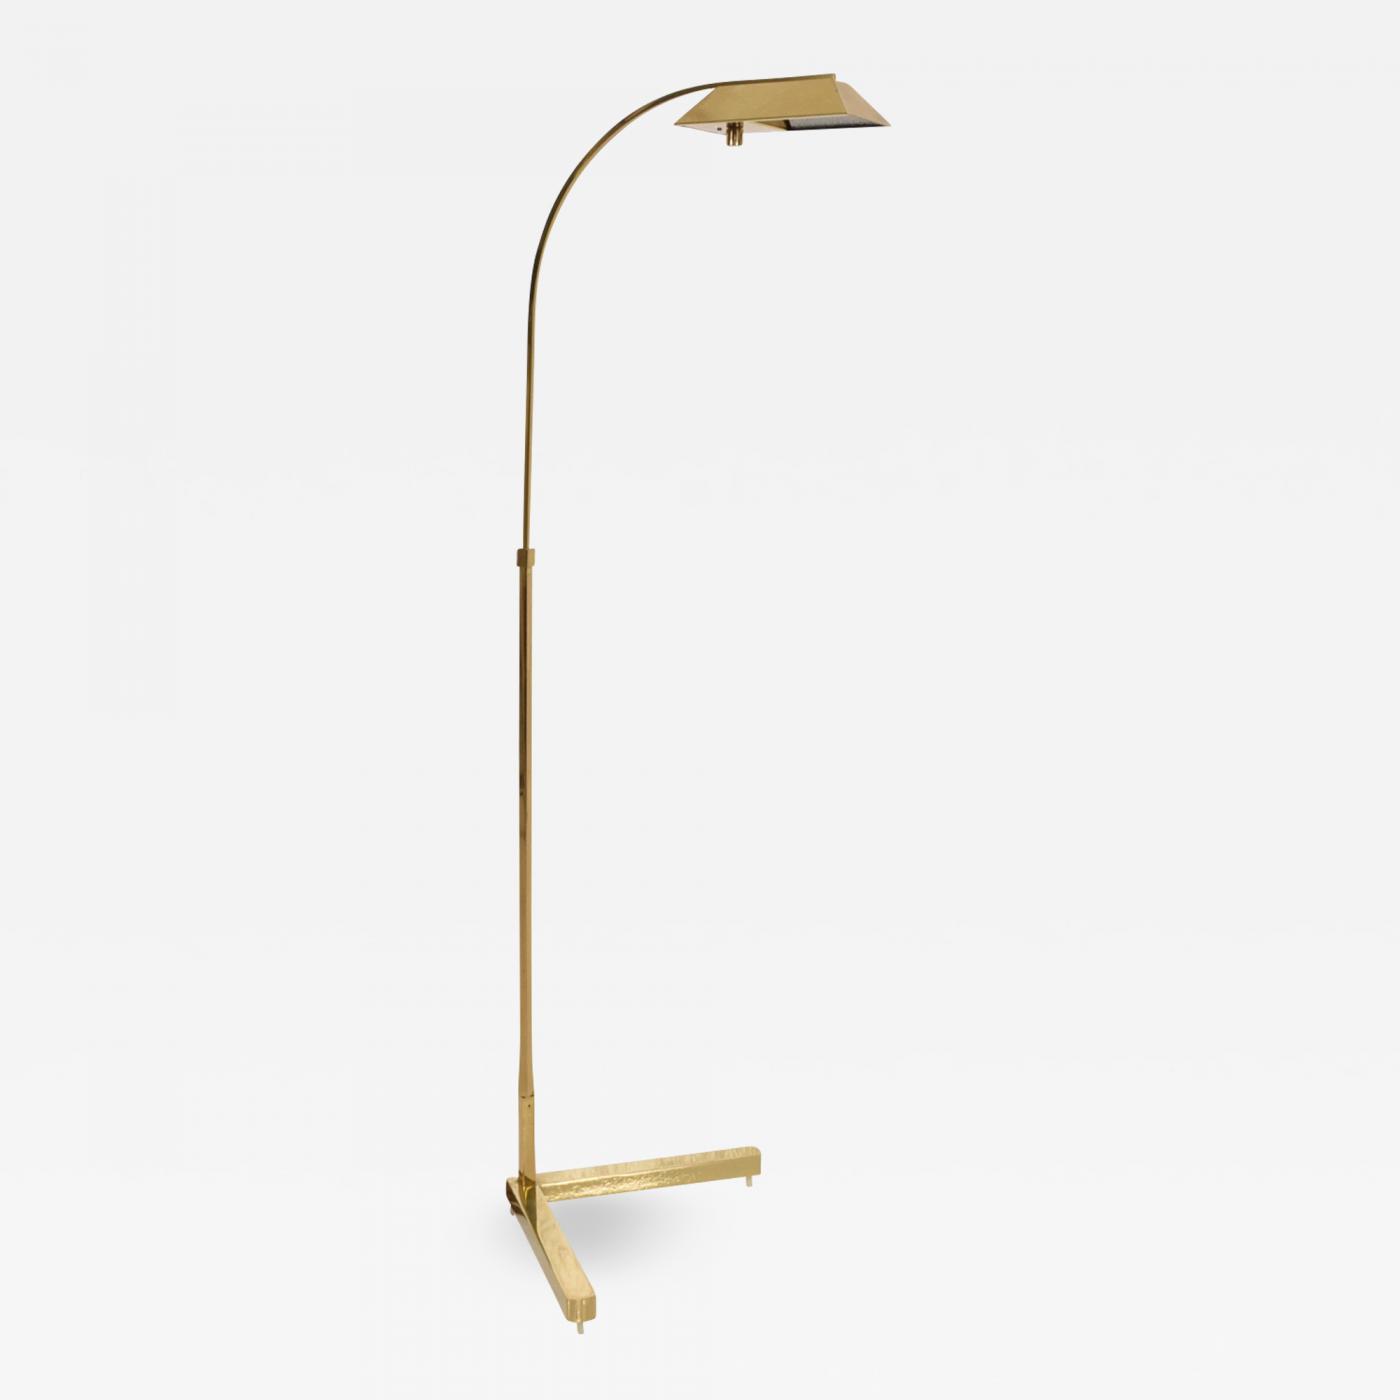 Casella Lighting Mid Century Modern Brass Floor Lamp By Casella